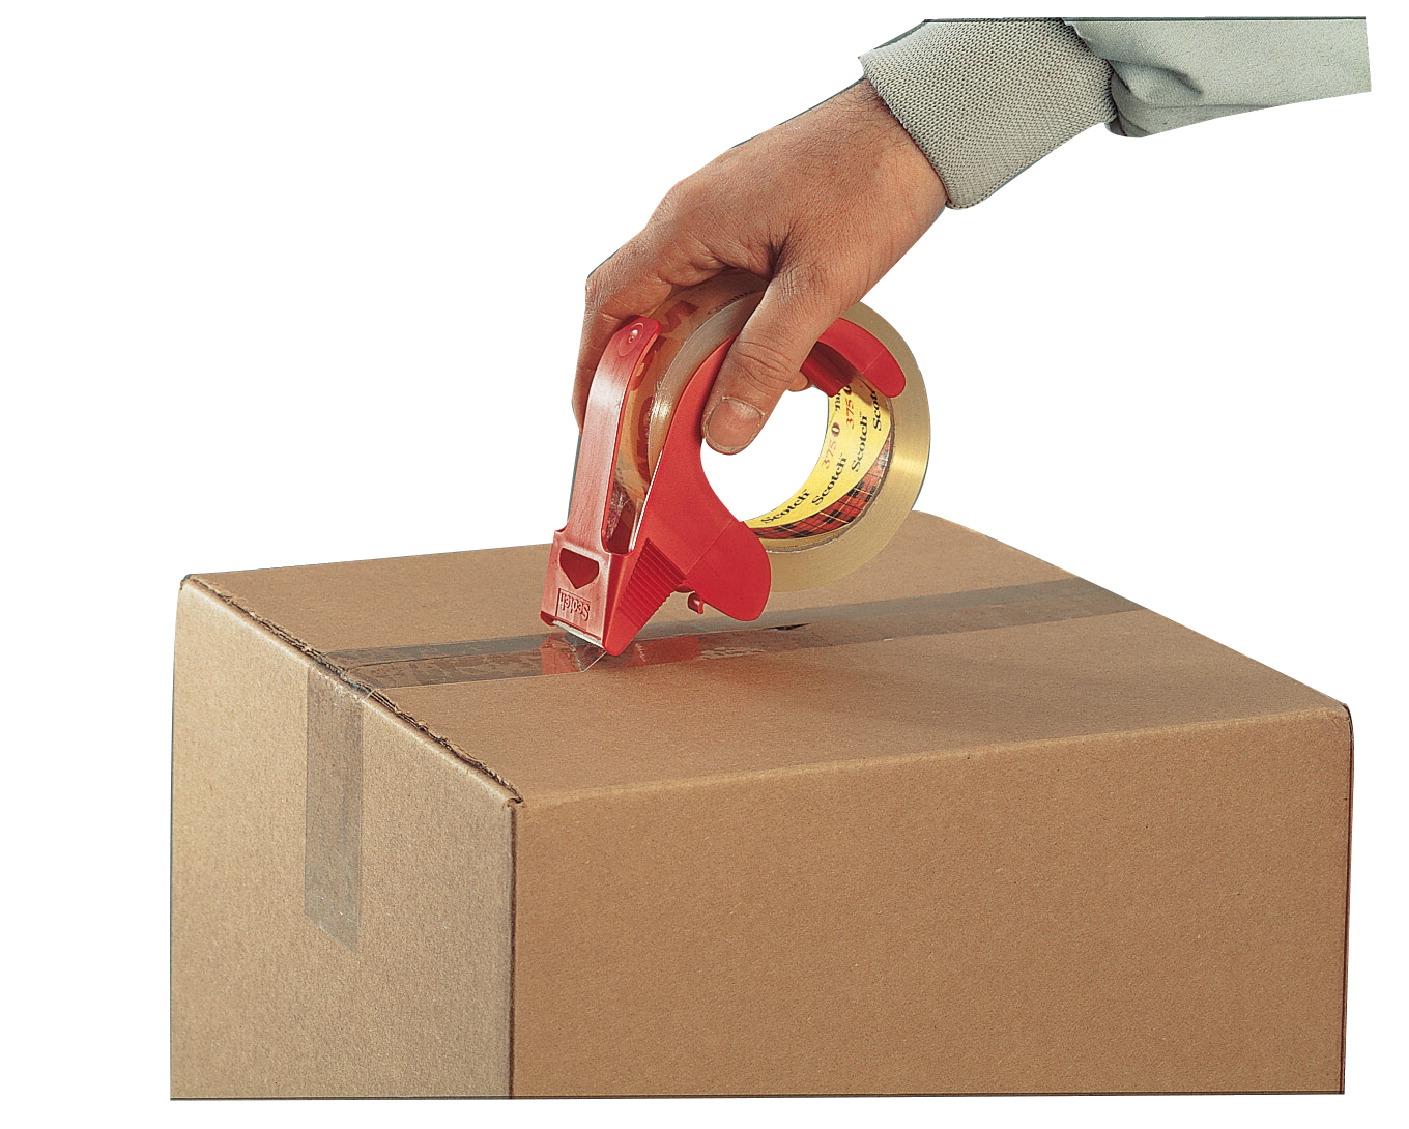 packaging tape soar life products. Black Bedroom Furniture Sets. Home Design Ideas